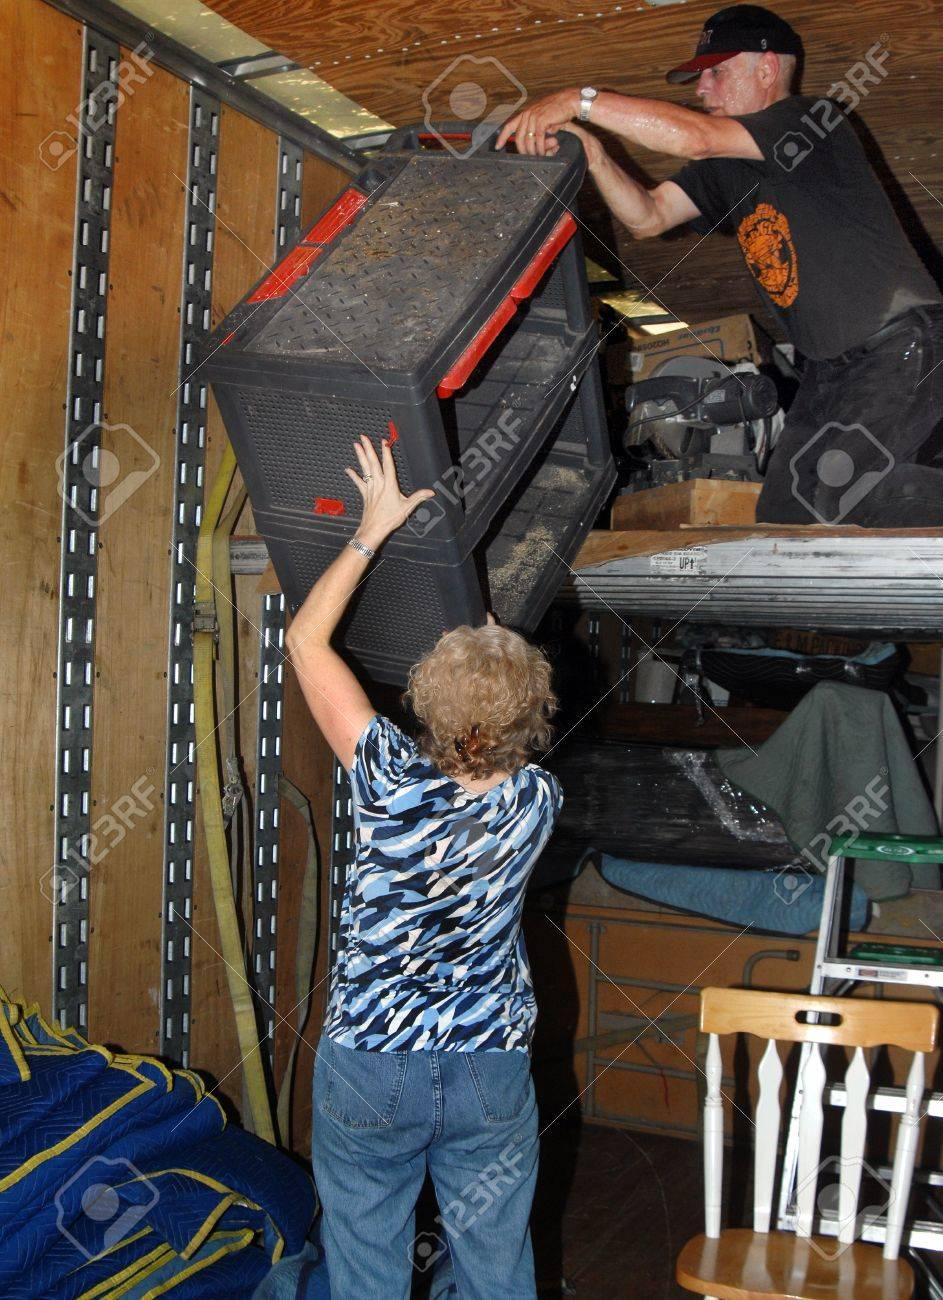 Couple work together to unload their moving van Husband is handing tool box to wife standing on floor It is hot work inside van - 14546549